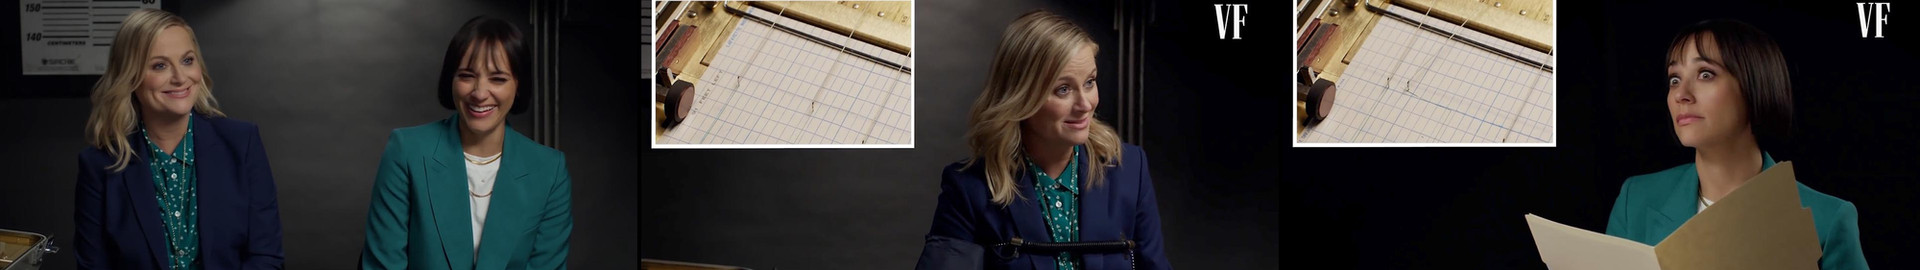 Amy Poehler & Rashida Jones Take a Lie Detector Test   Vanity Fair